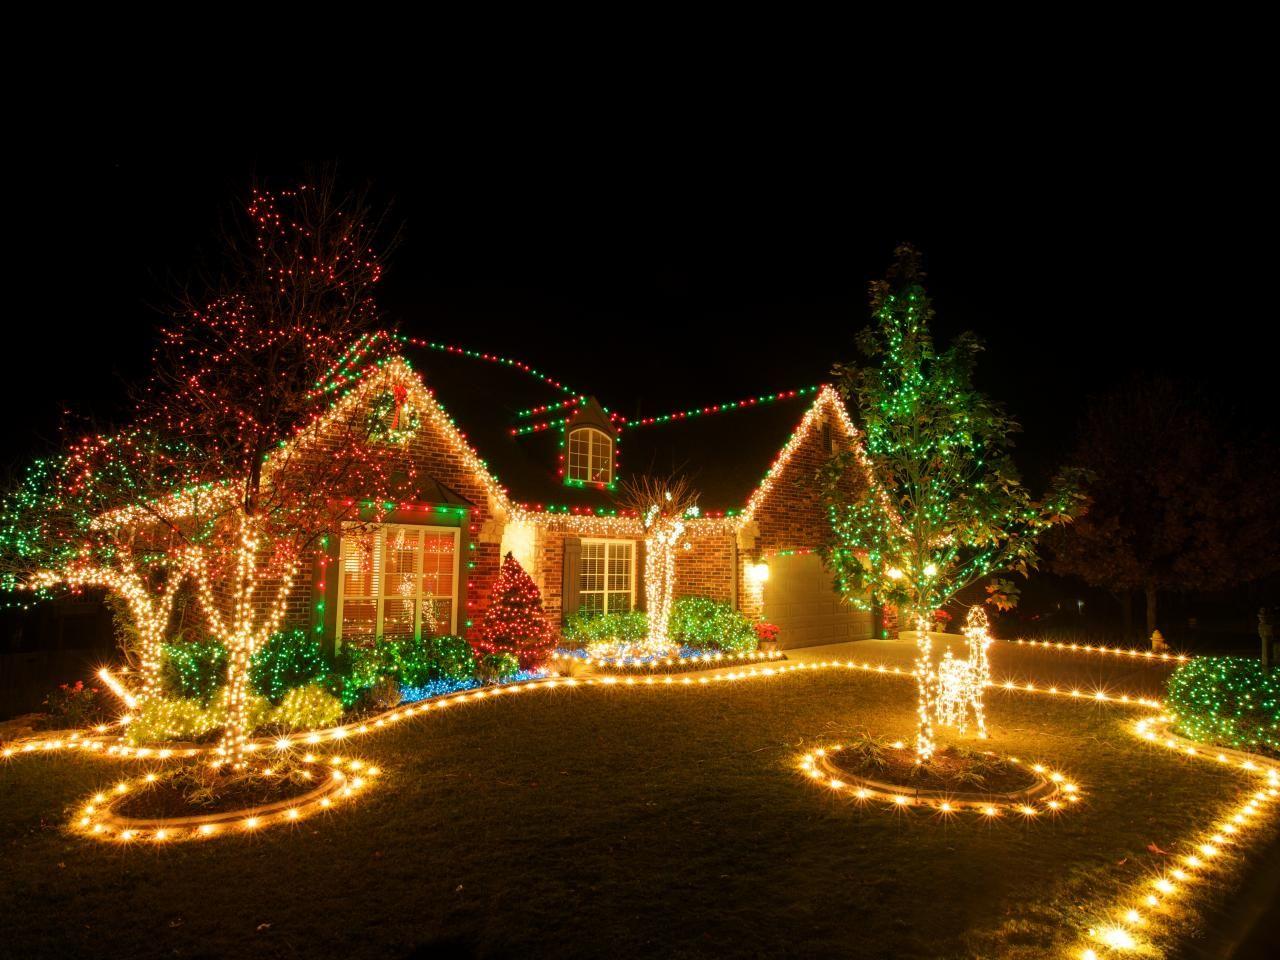 Resultado de imagen para christmas outdoor hanging lights on trees resultado de imagen para christmas outdoor hanging lights on trees aloadofball Choice Image